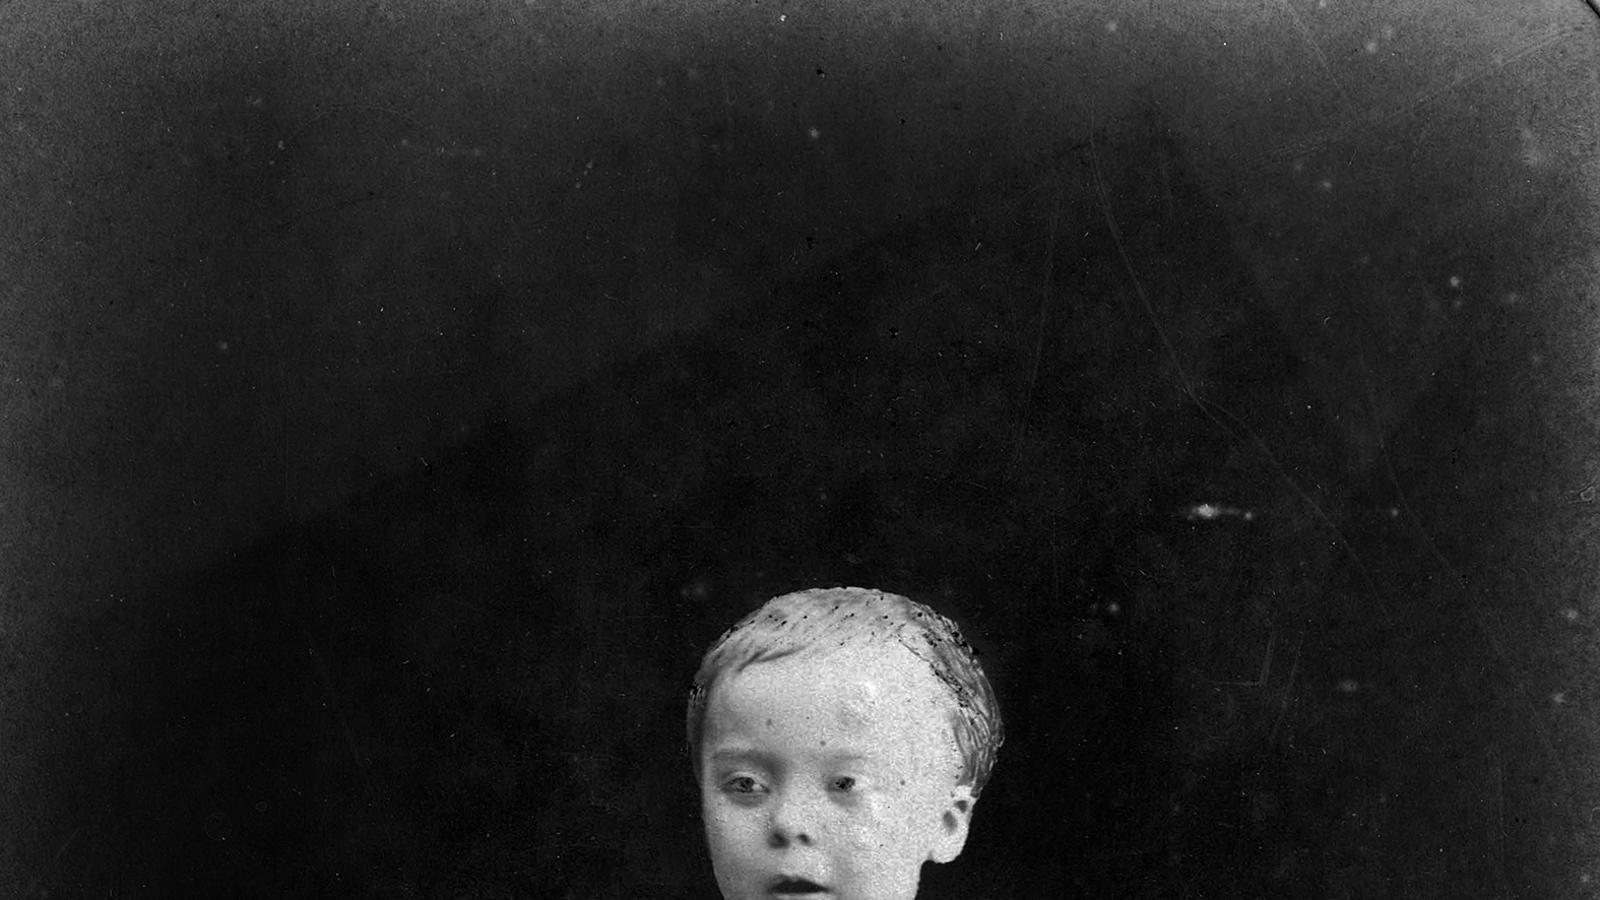 Francesc Layret de petit. Arxiu familiar